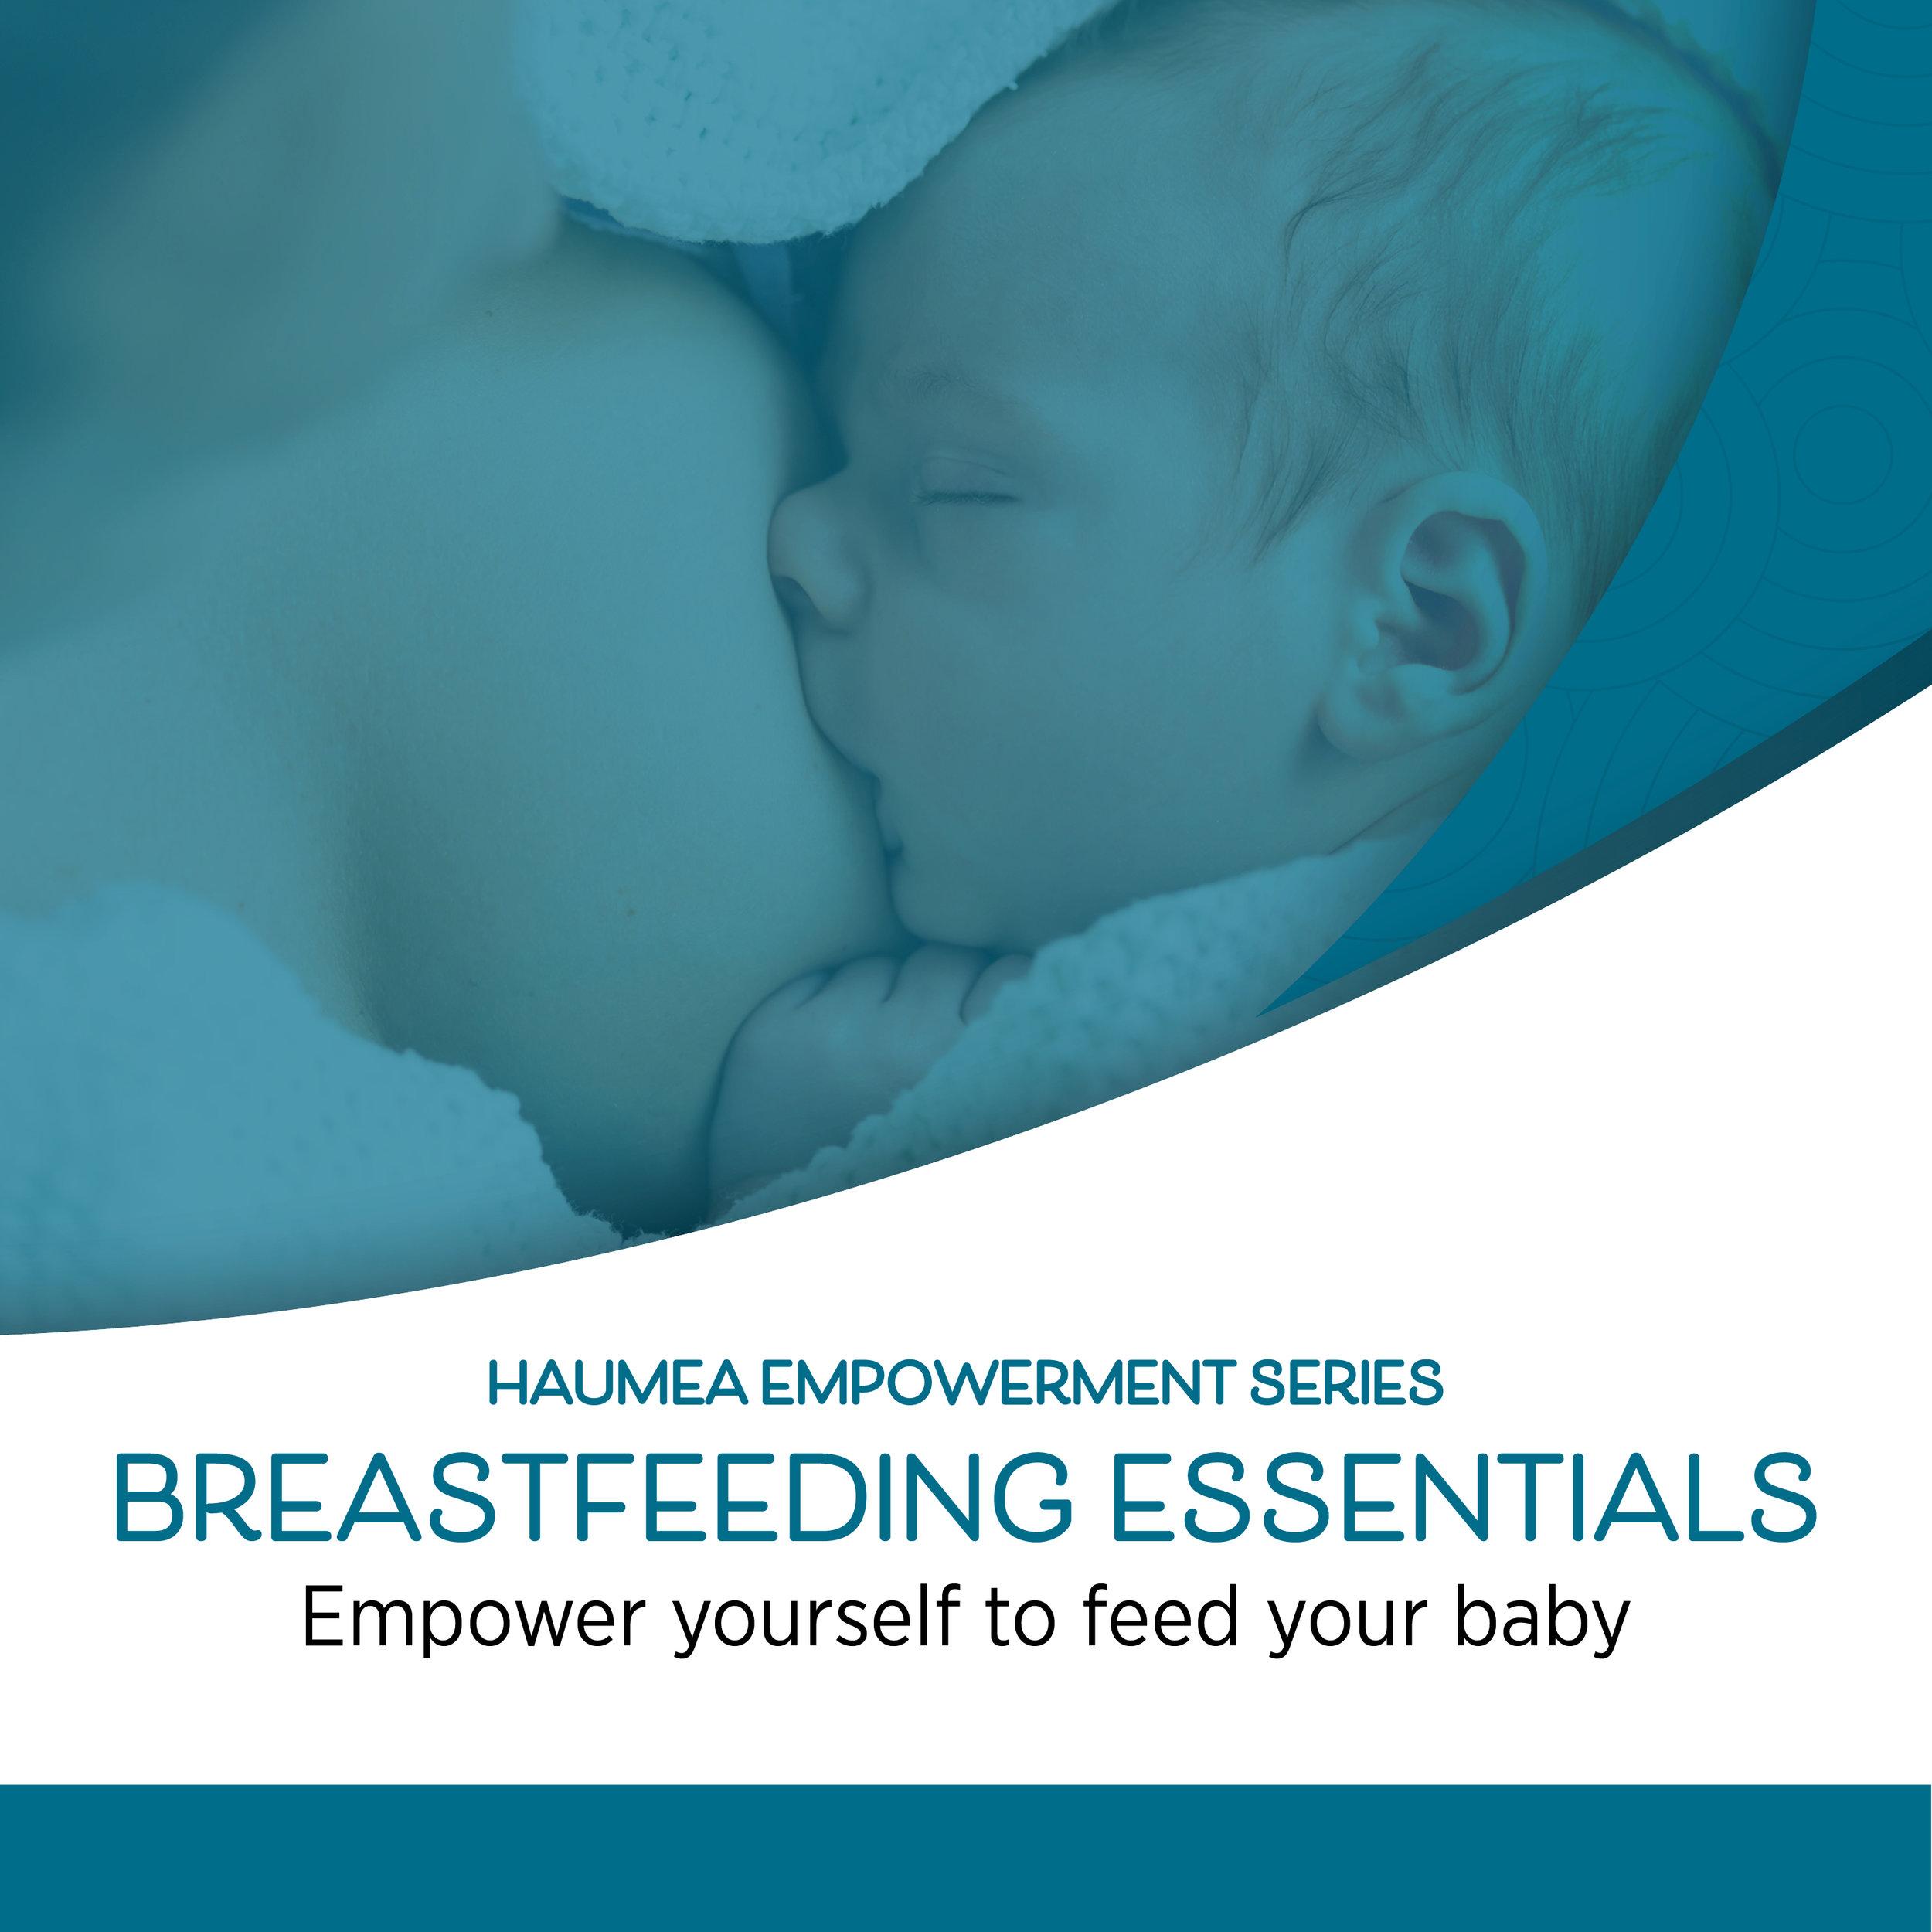 Haumea_2019_Event_Breastfeeding Essentials_Web.jpg